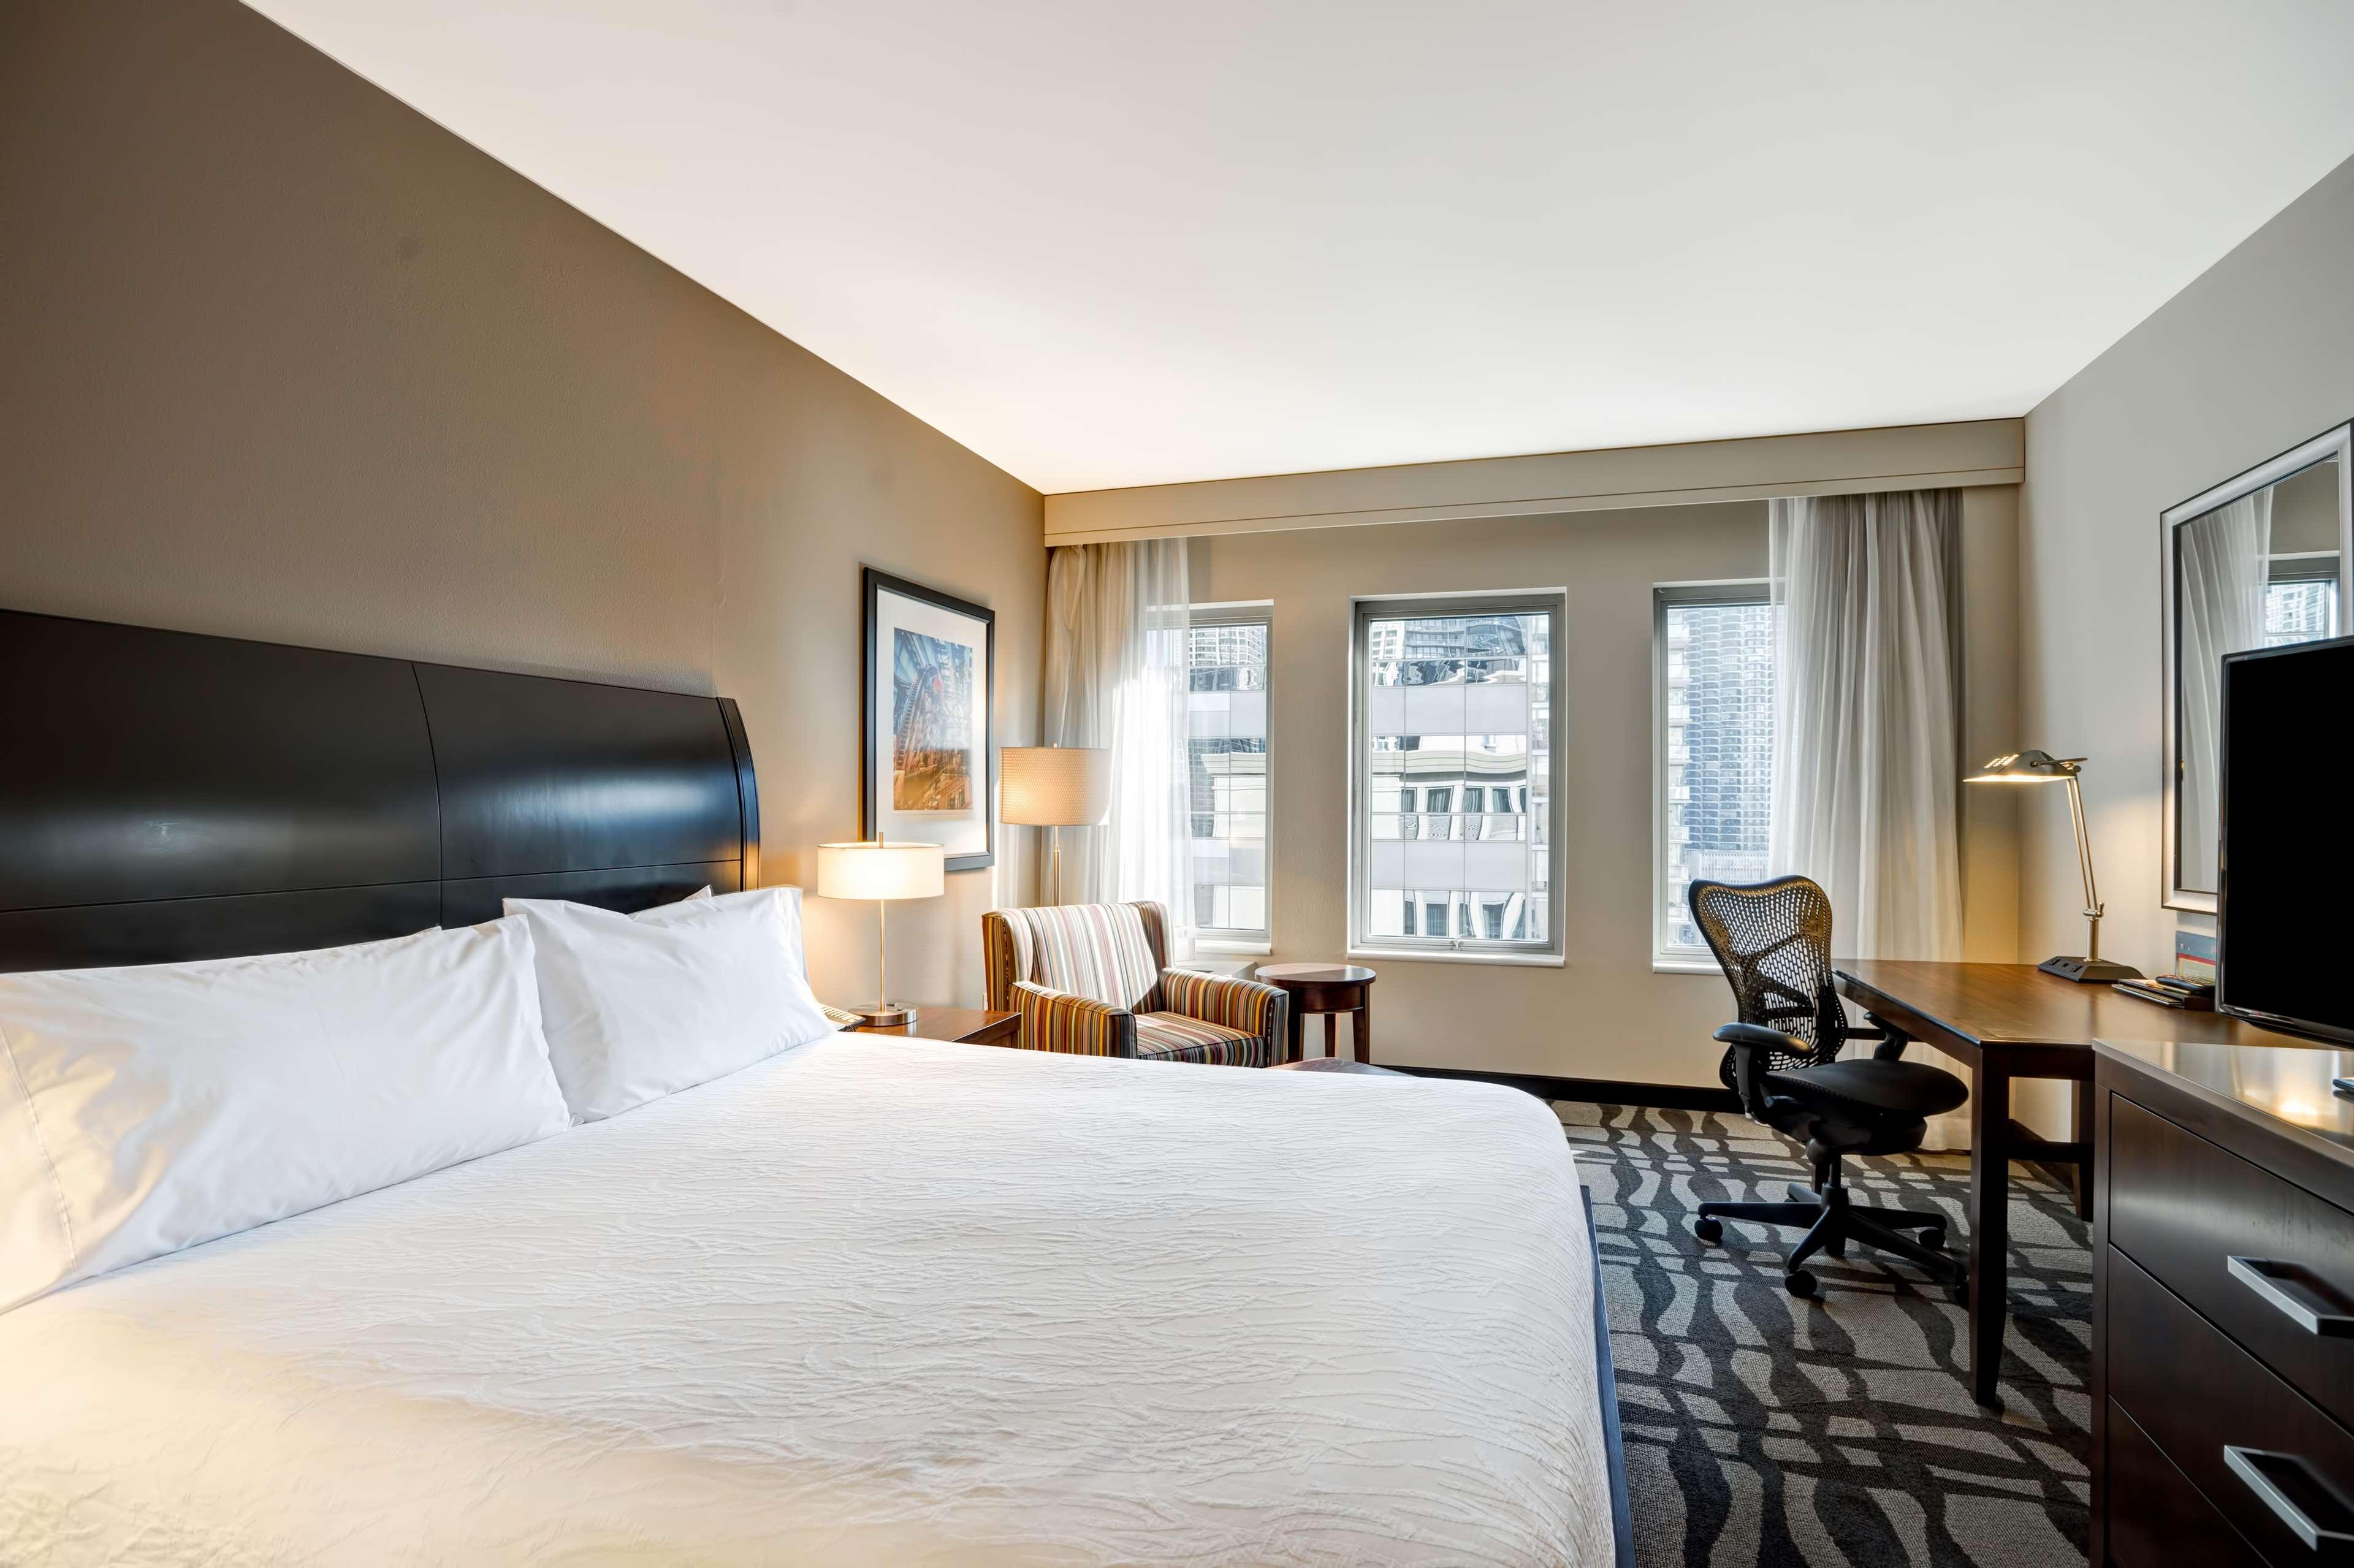 Hilton Garden Inn Chicago Downtown/Magnificent Mile image 18